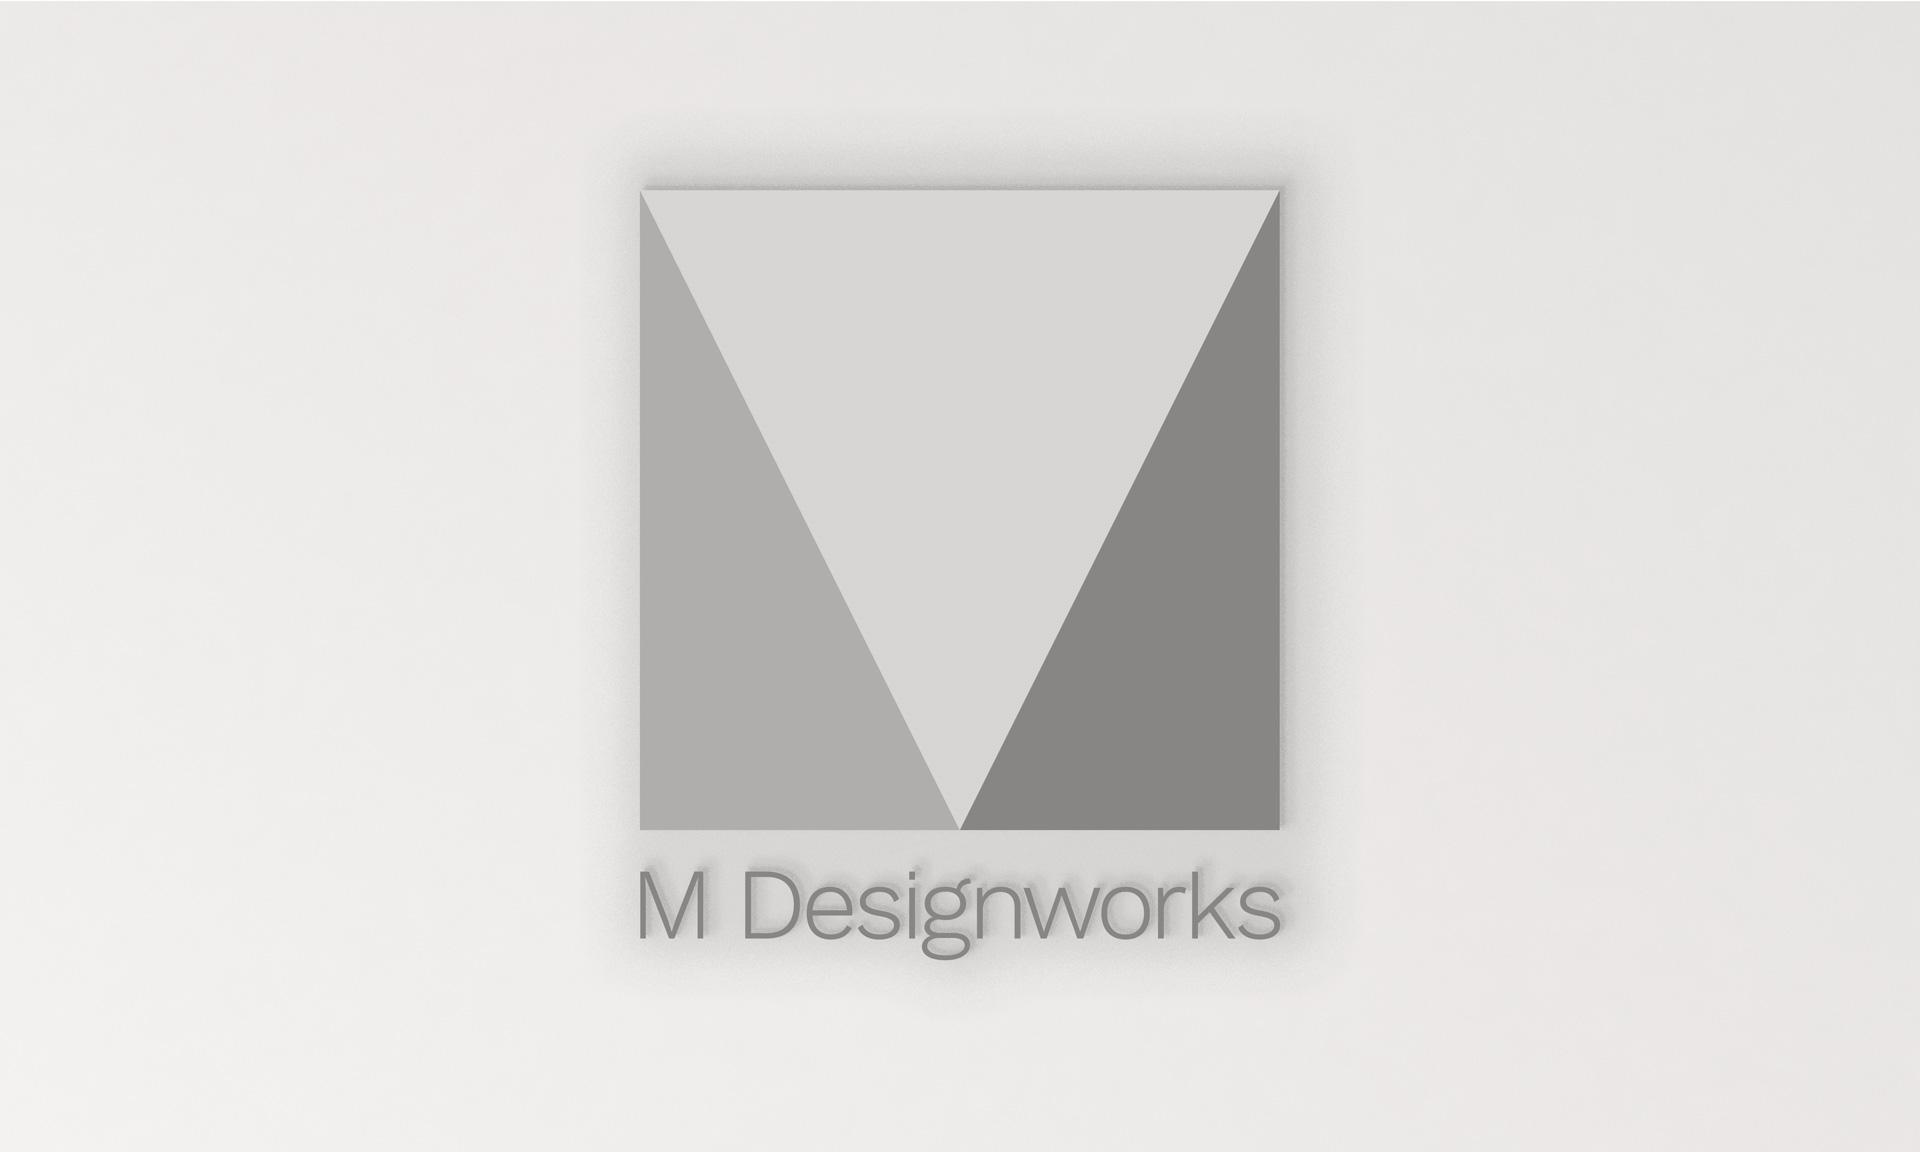 M Designworks grayscale logo